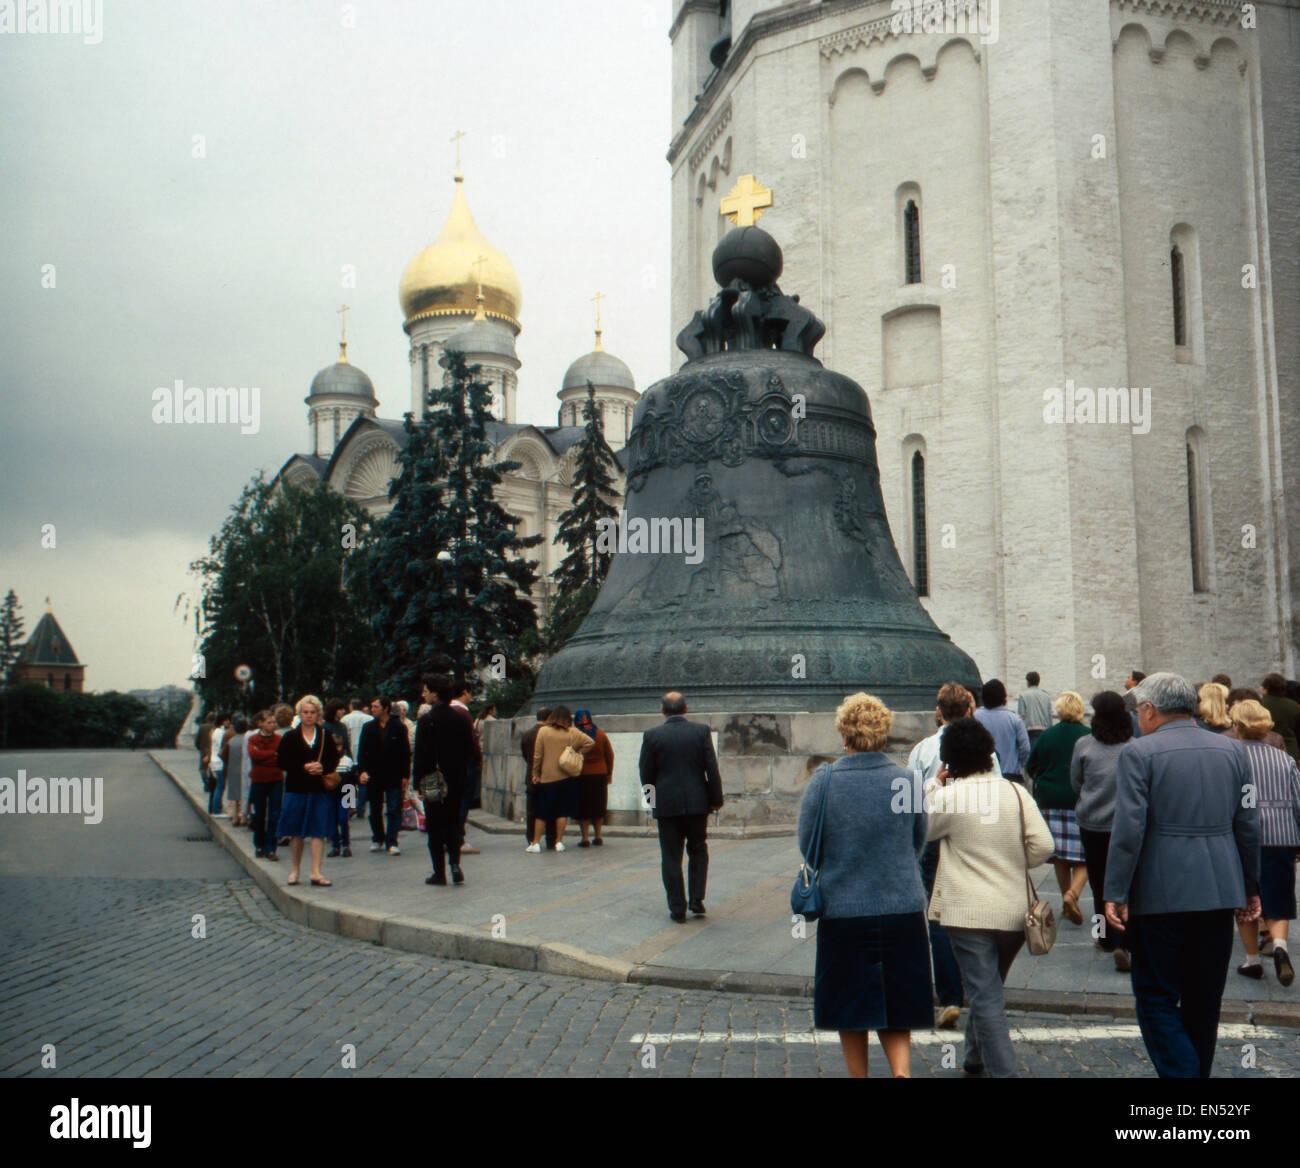 Eine Reise nach Moskau, Russland 1980er Jahre. A trip to Moscow, Russia 1980s. Stock Photo